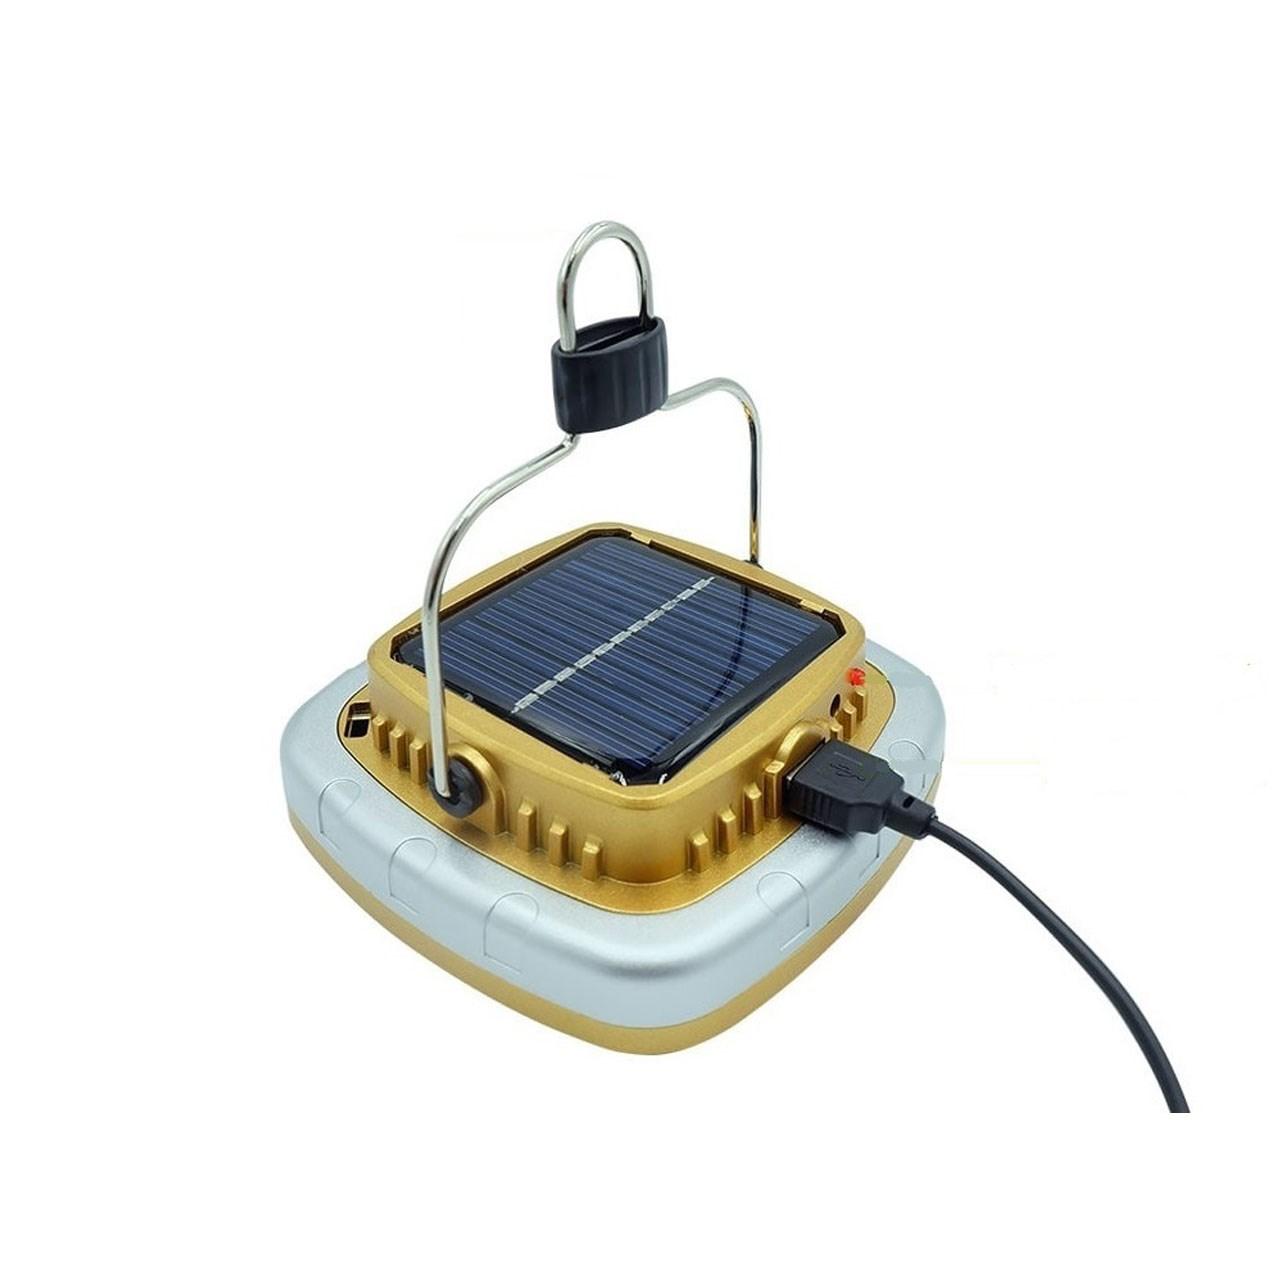 خرید                                     چراغ قوه کمپینگ شارژی مدل خورشیدی